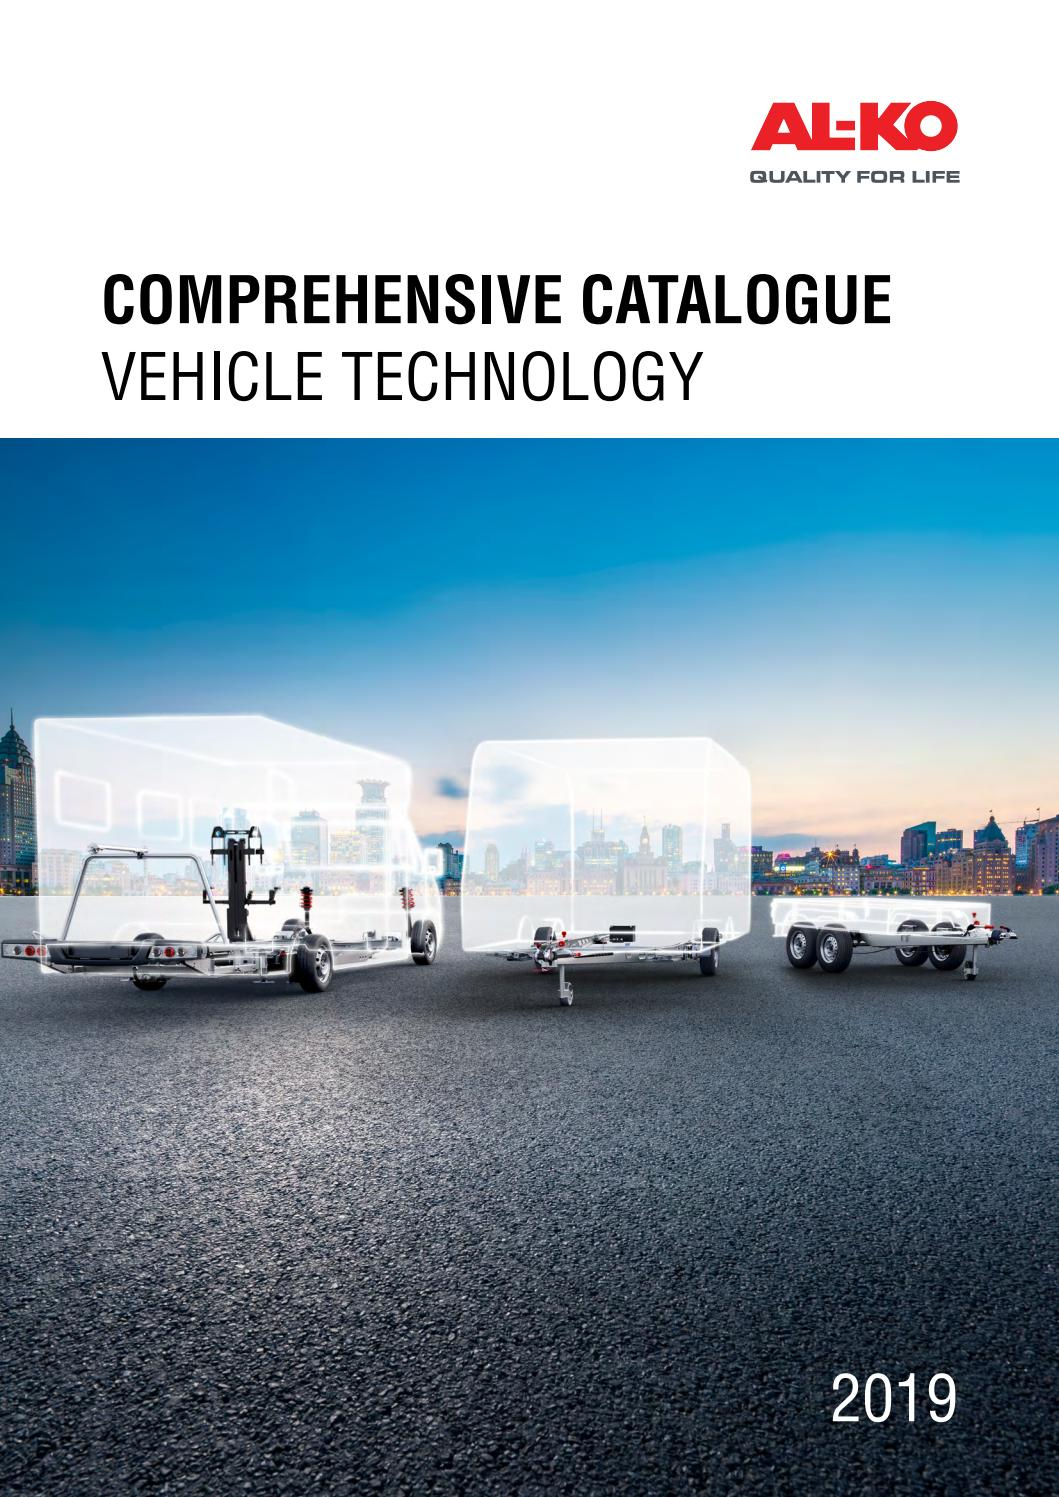 4 PACK 56mm AL-KO Dust Cap Wheel Hub Trailer Caravan Bearing Grease Alko